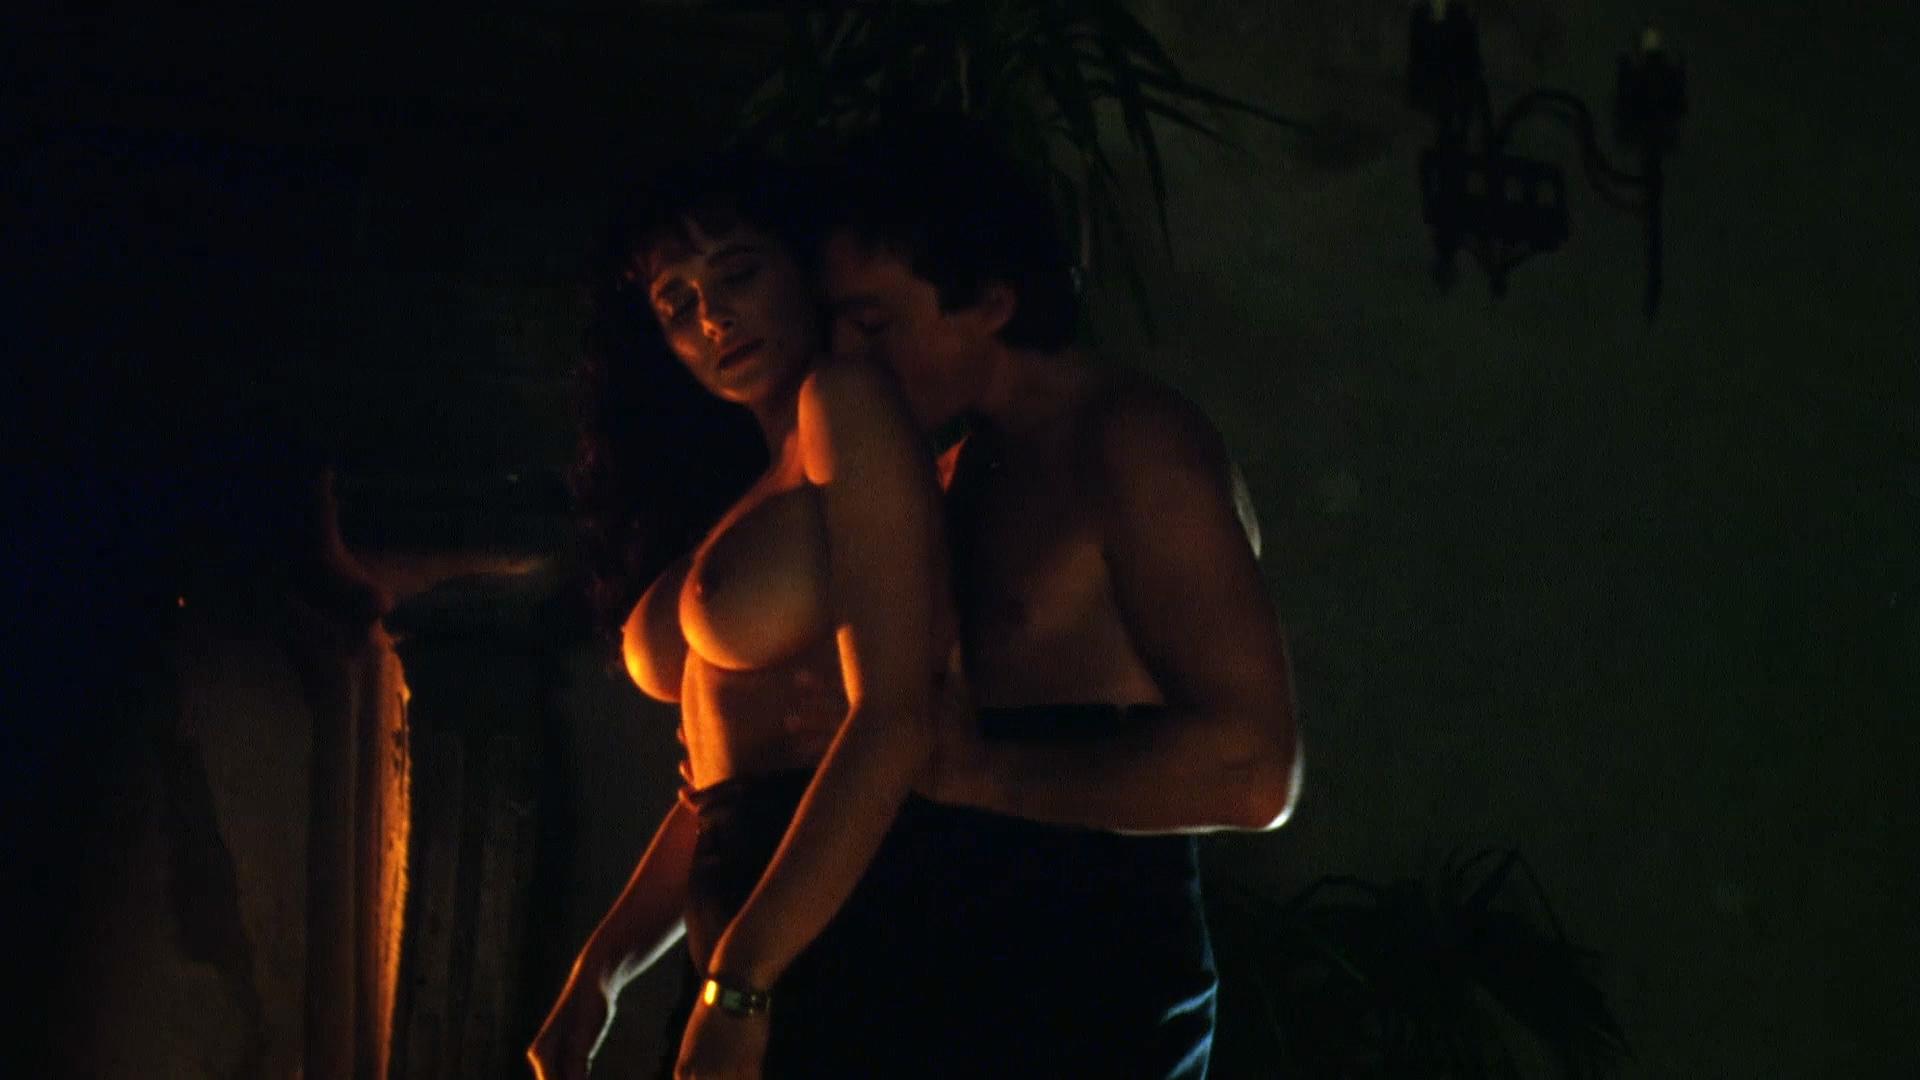 Meridian blanca porno videos Sherilyn Fenn Nude Topless And Sex Charlie Spradling Nude Busty Meridian 1990 Hd 1080p Bluray